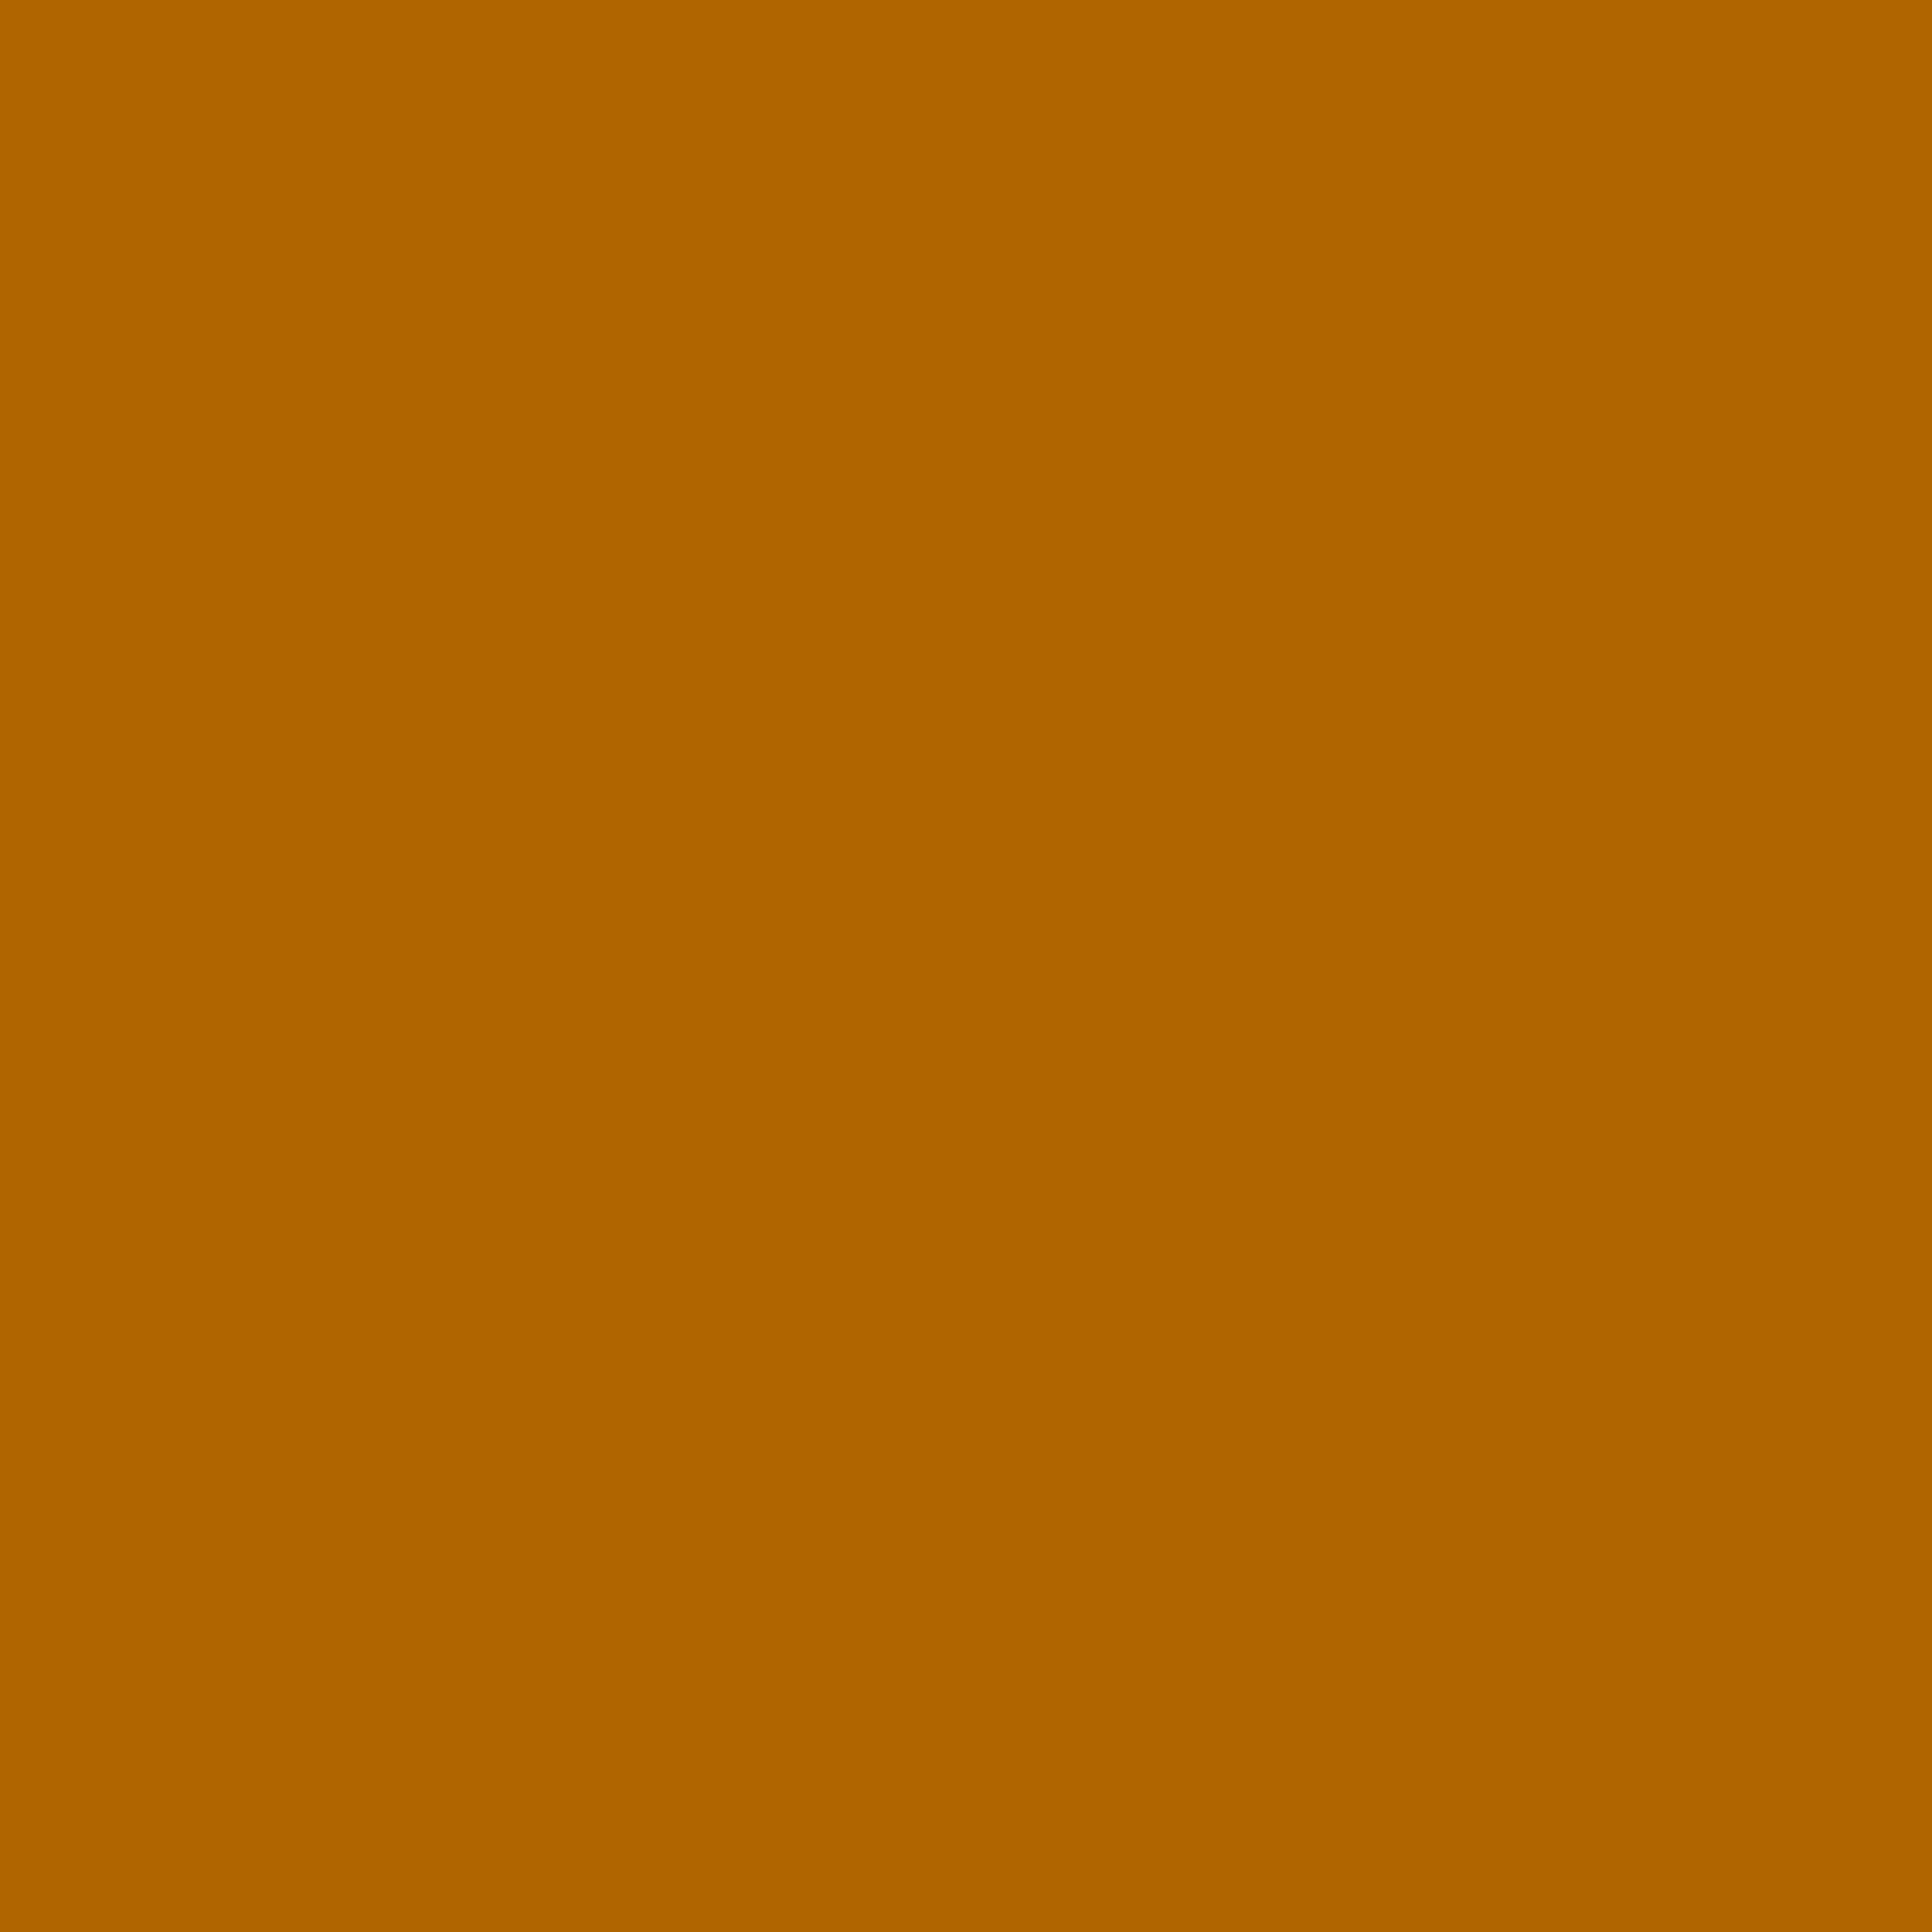 2732x2732 Ginger Solid Color Background